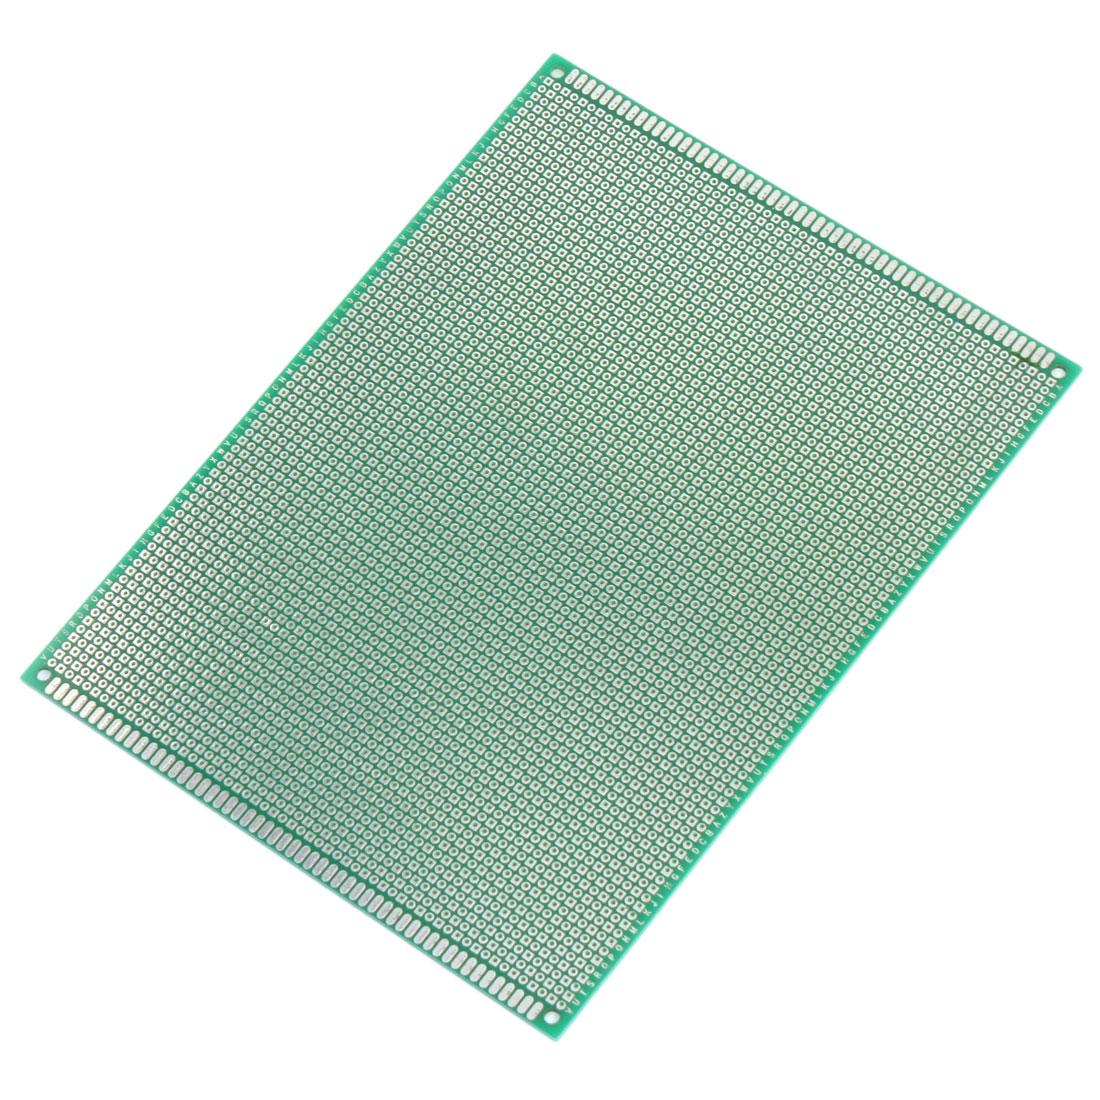 Single Side Universal Prototype Paper PCB Print Circuit Board 15x20cm